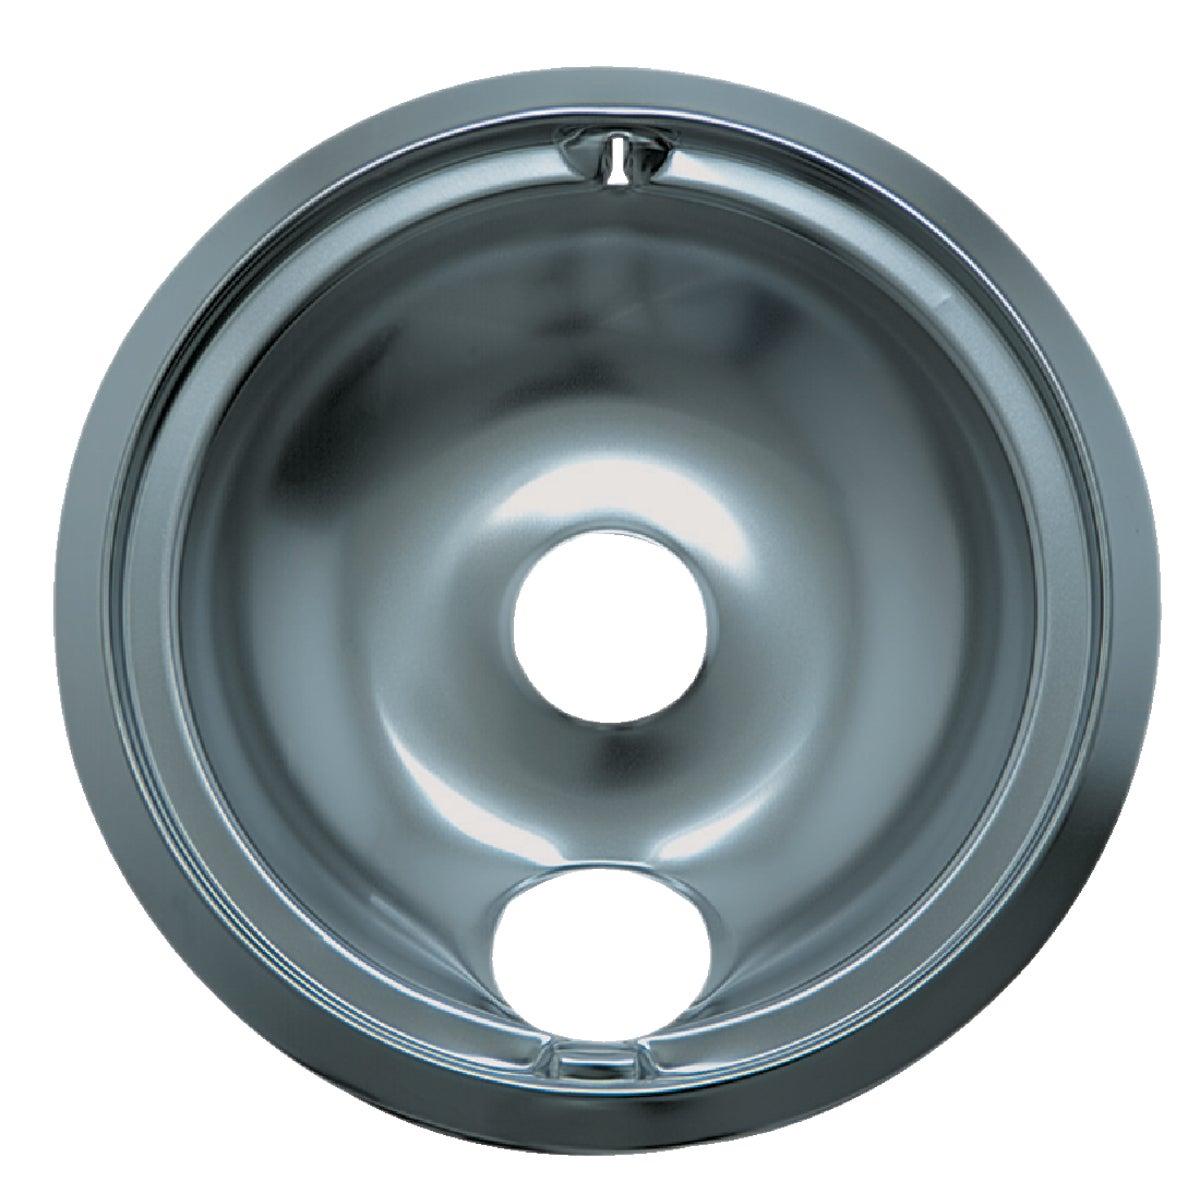 "8"" CHROME DRIP PAN"